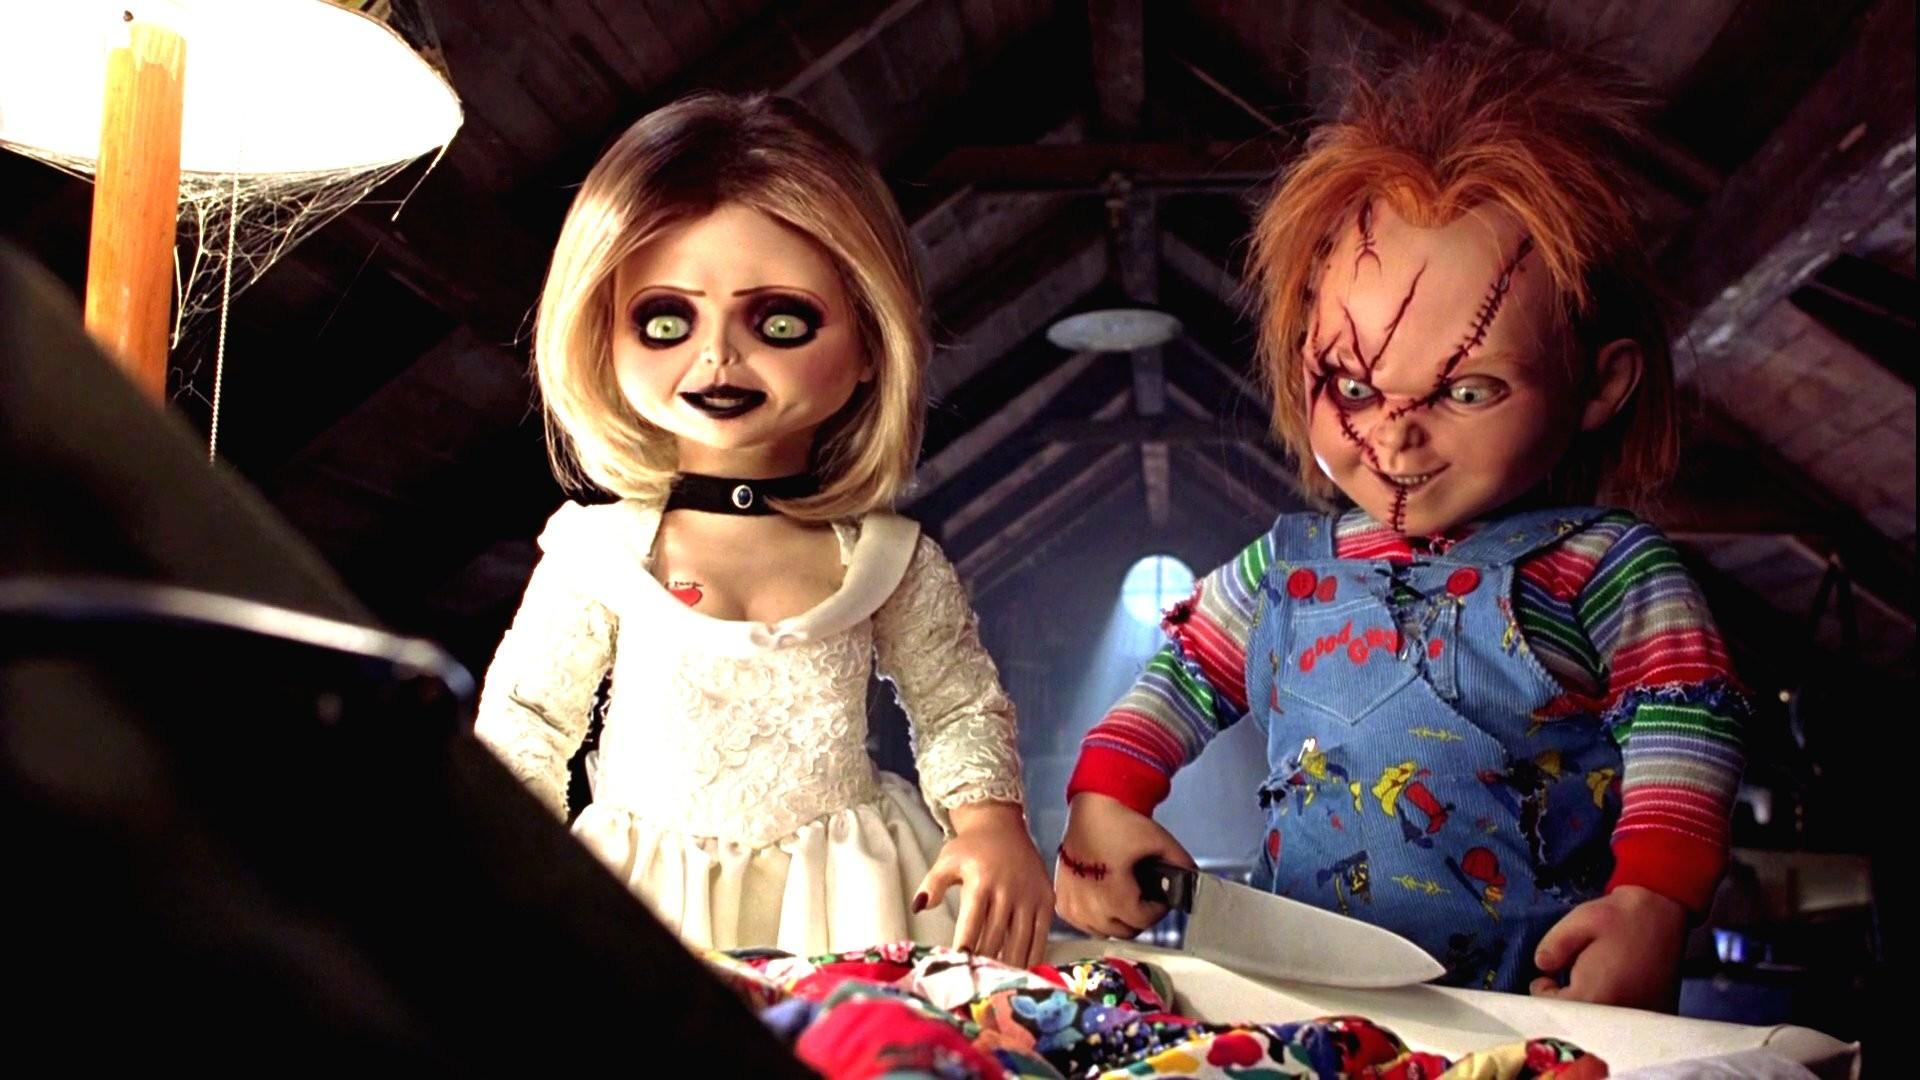 CHILDS PLAY chucky dark horror creepy scary (4) wallpaper | |  235494 | WallpaperUP